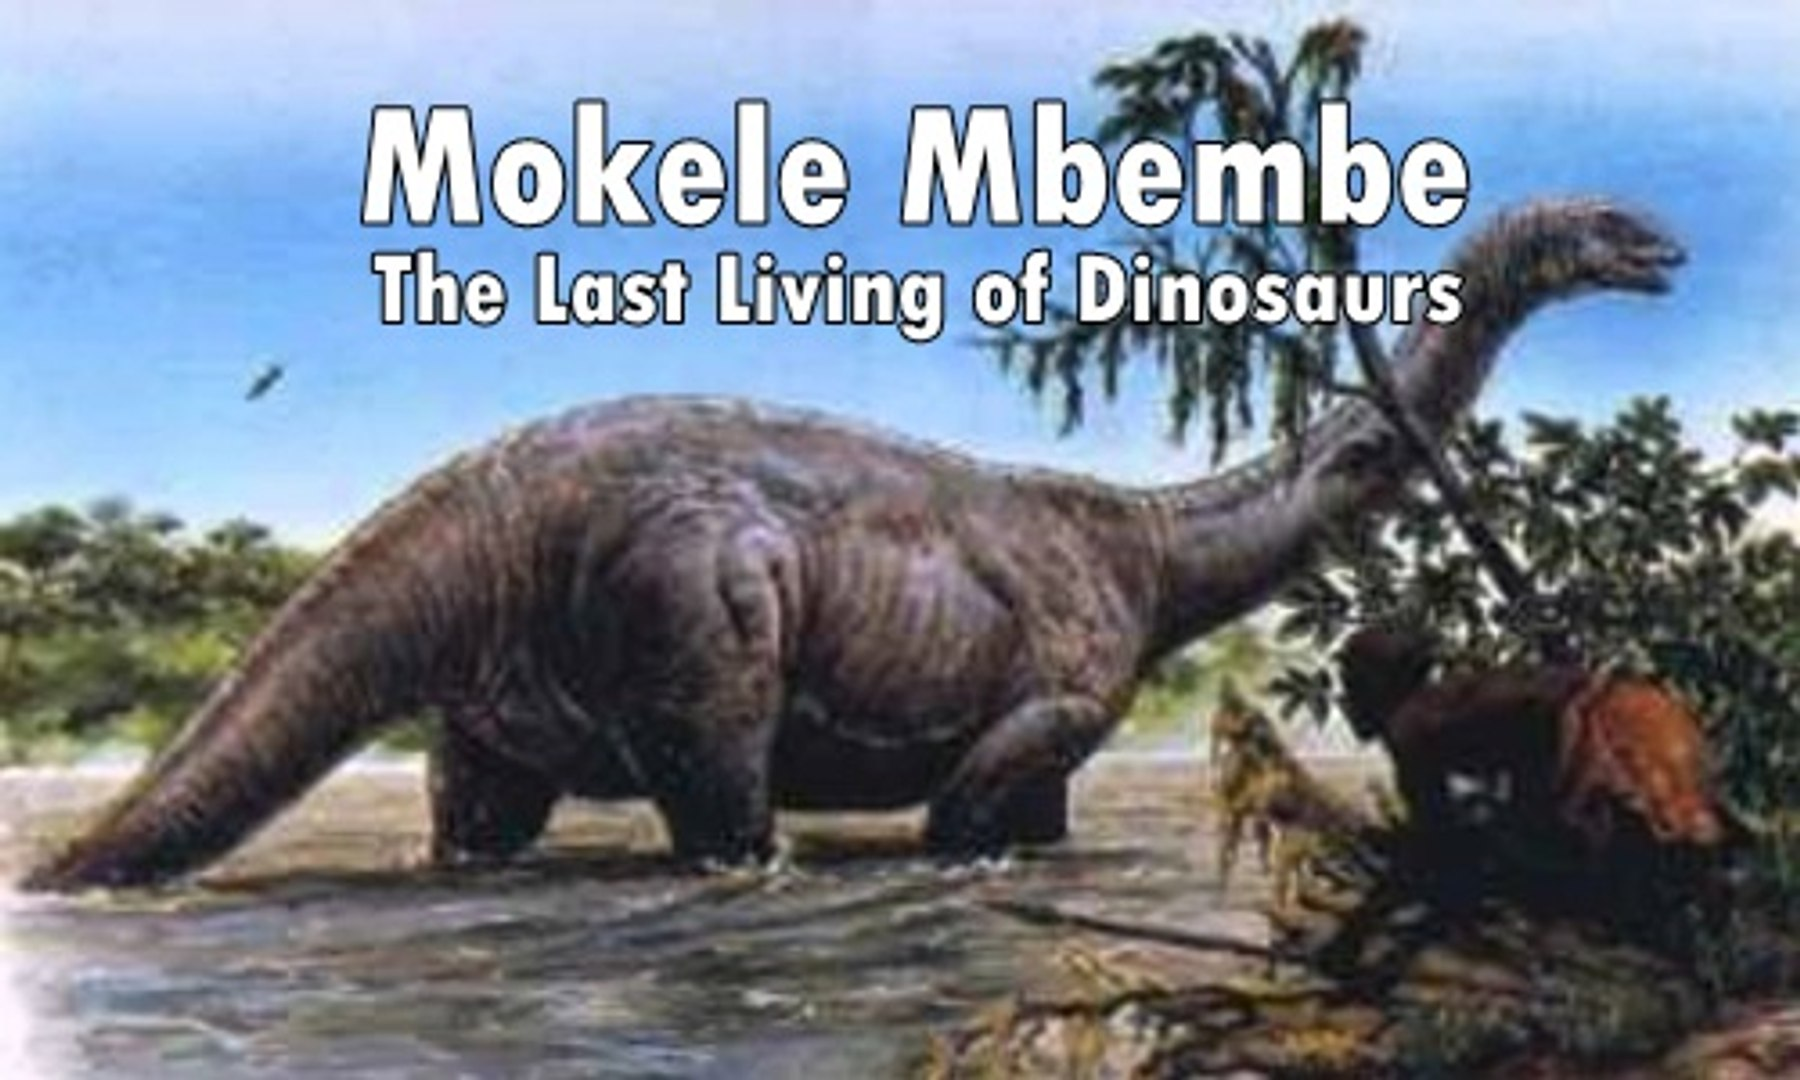 Mokele Mbembe - The Last Living of Dinosaurs